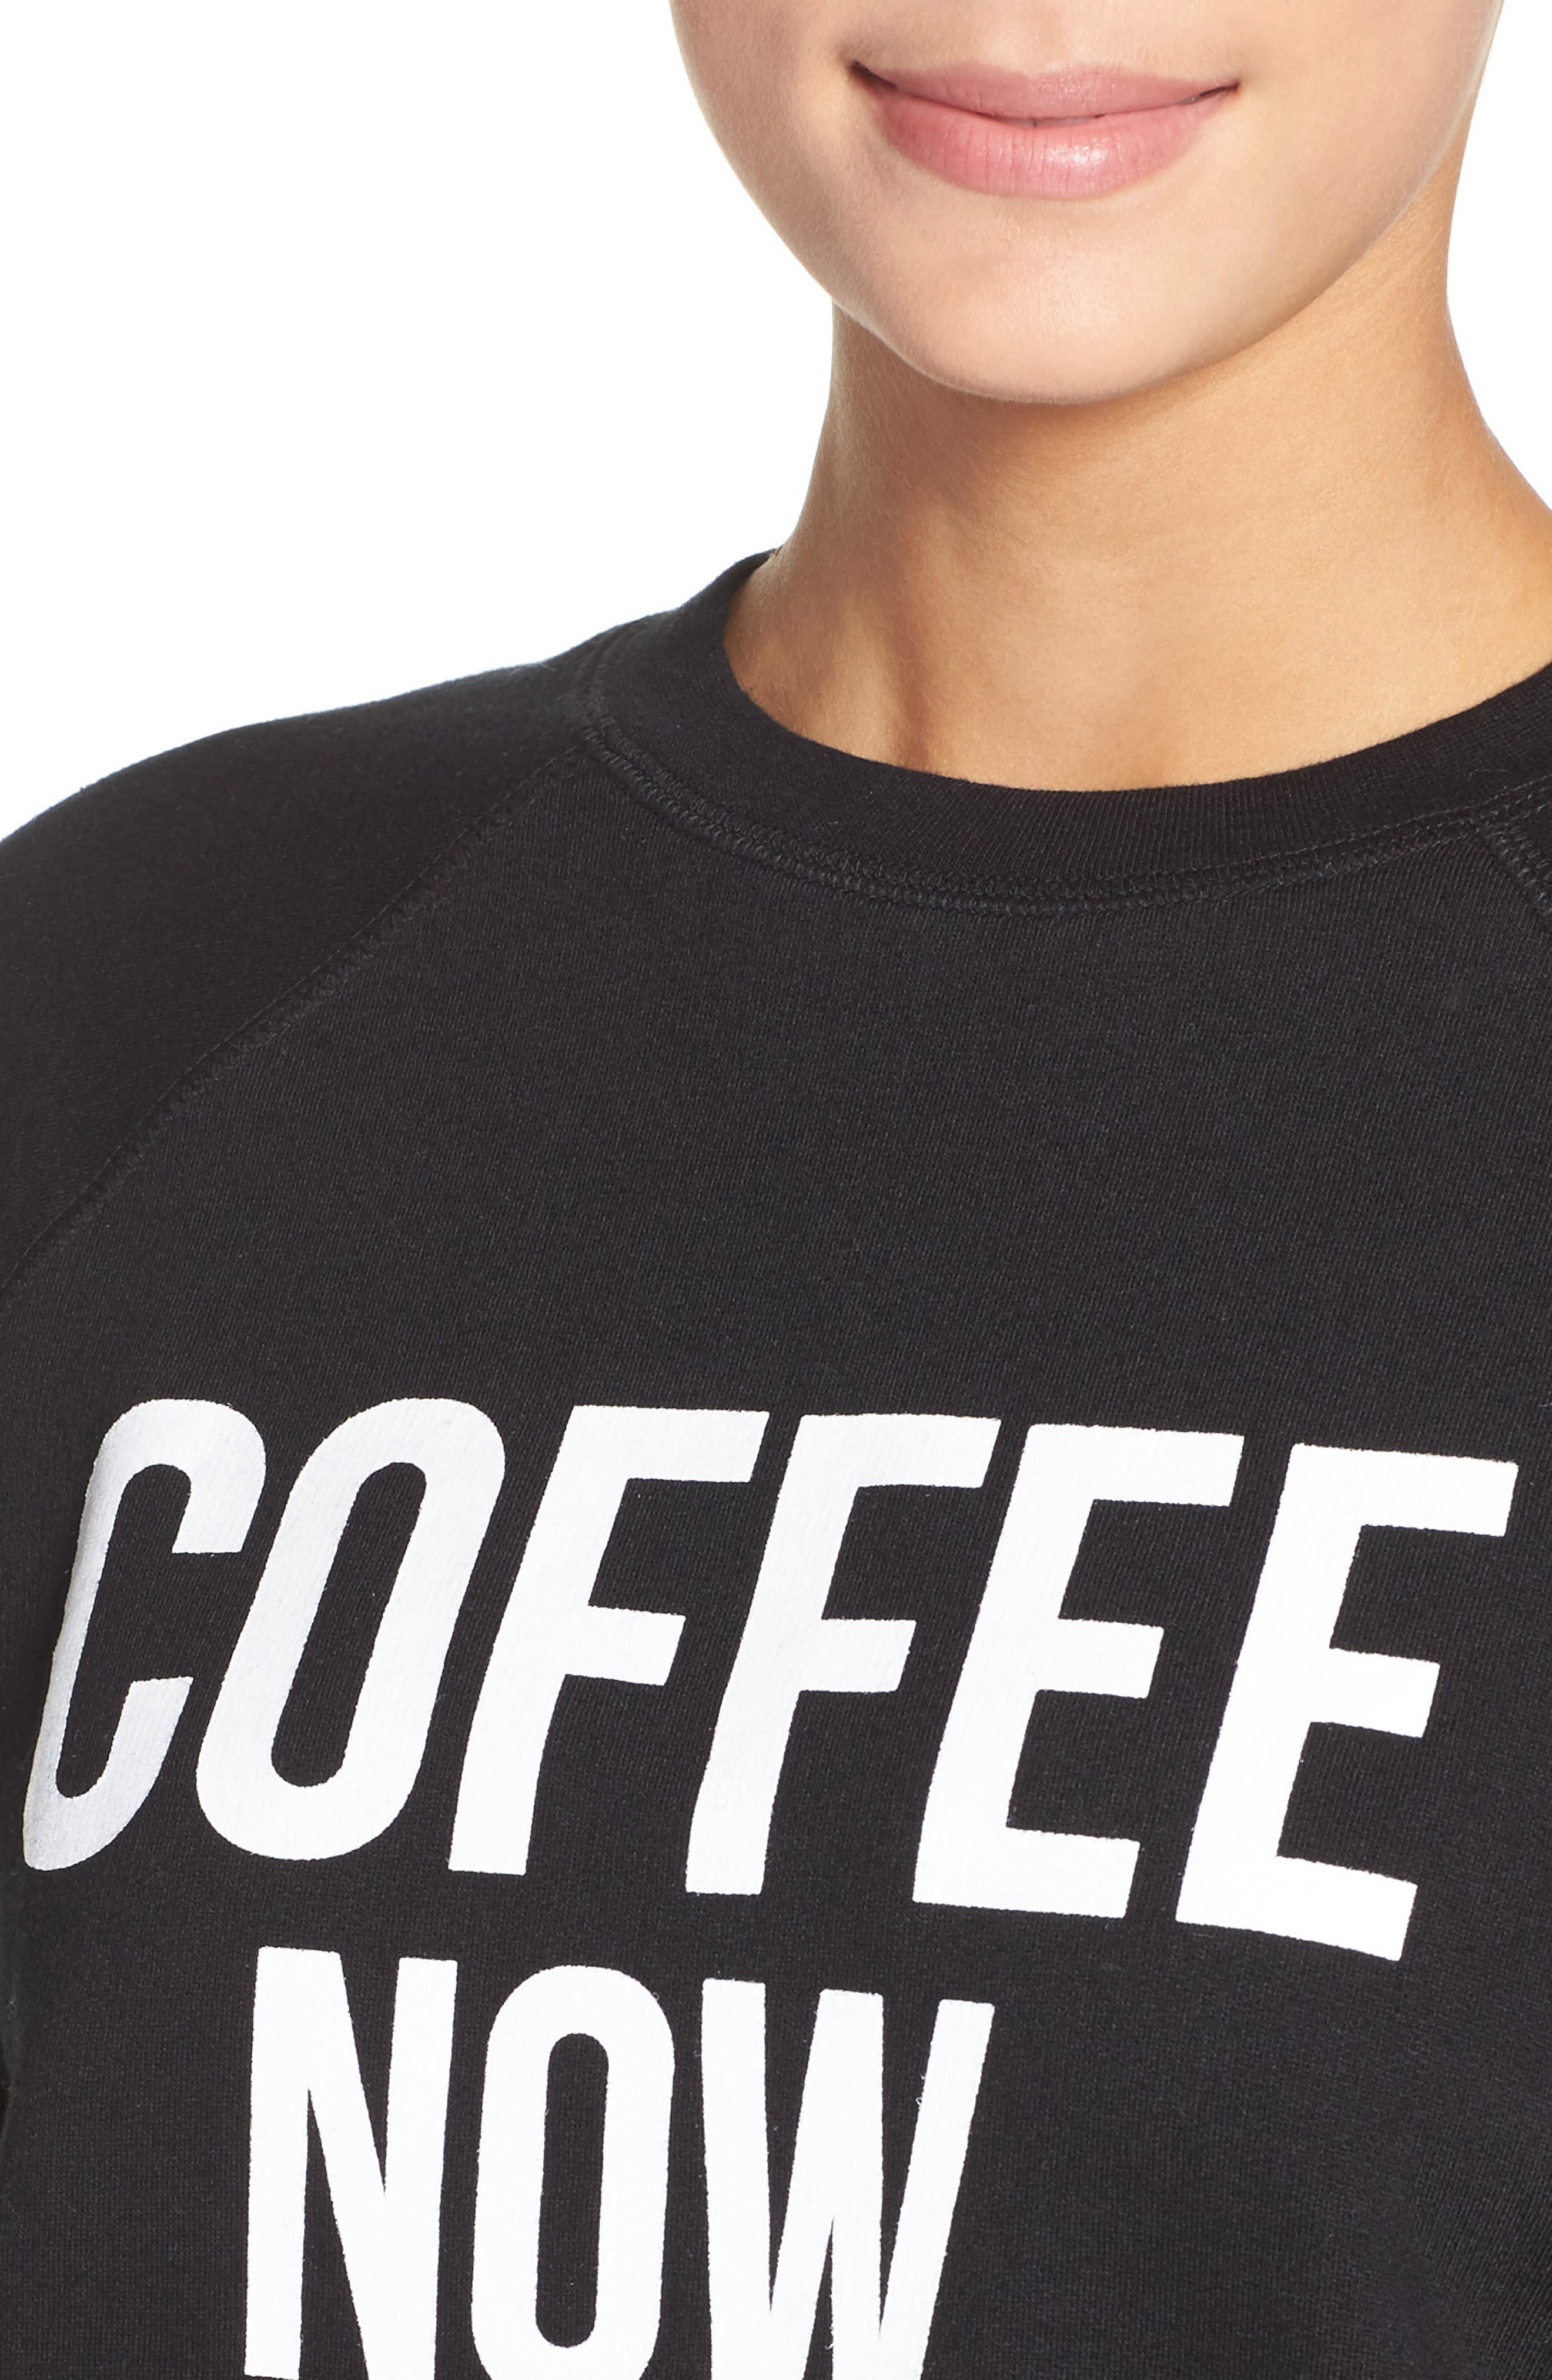 Brunette 'Coffee Now' Crewneck Sweatshirt,                             Alternate thumbnail 4, color,                             Black